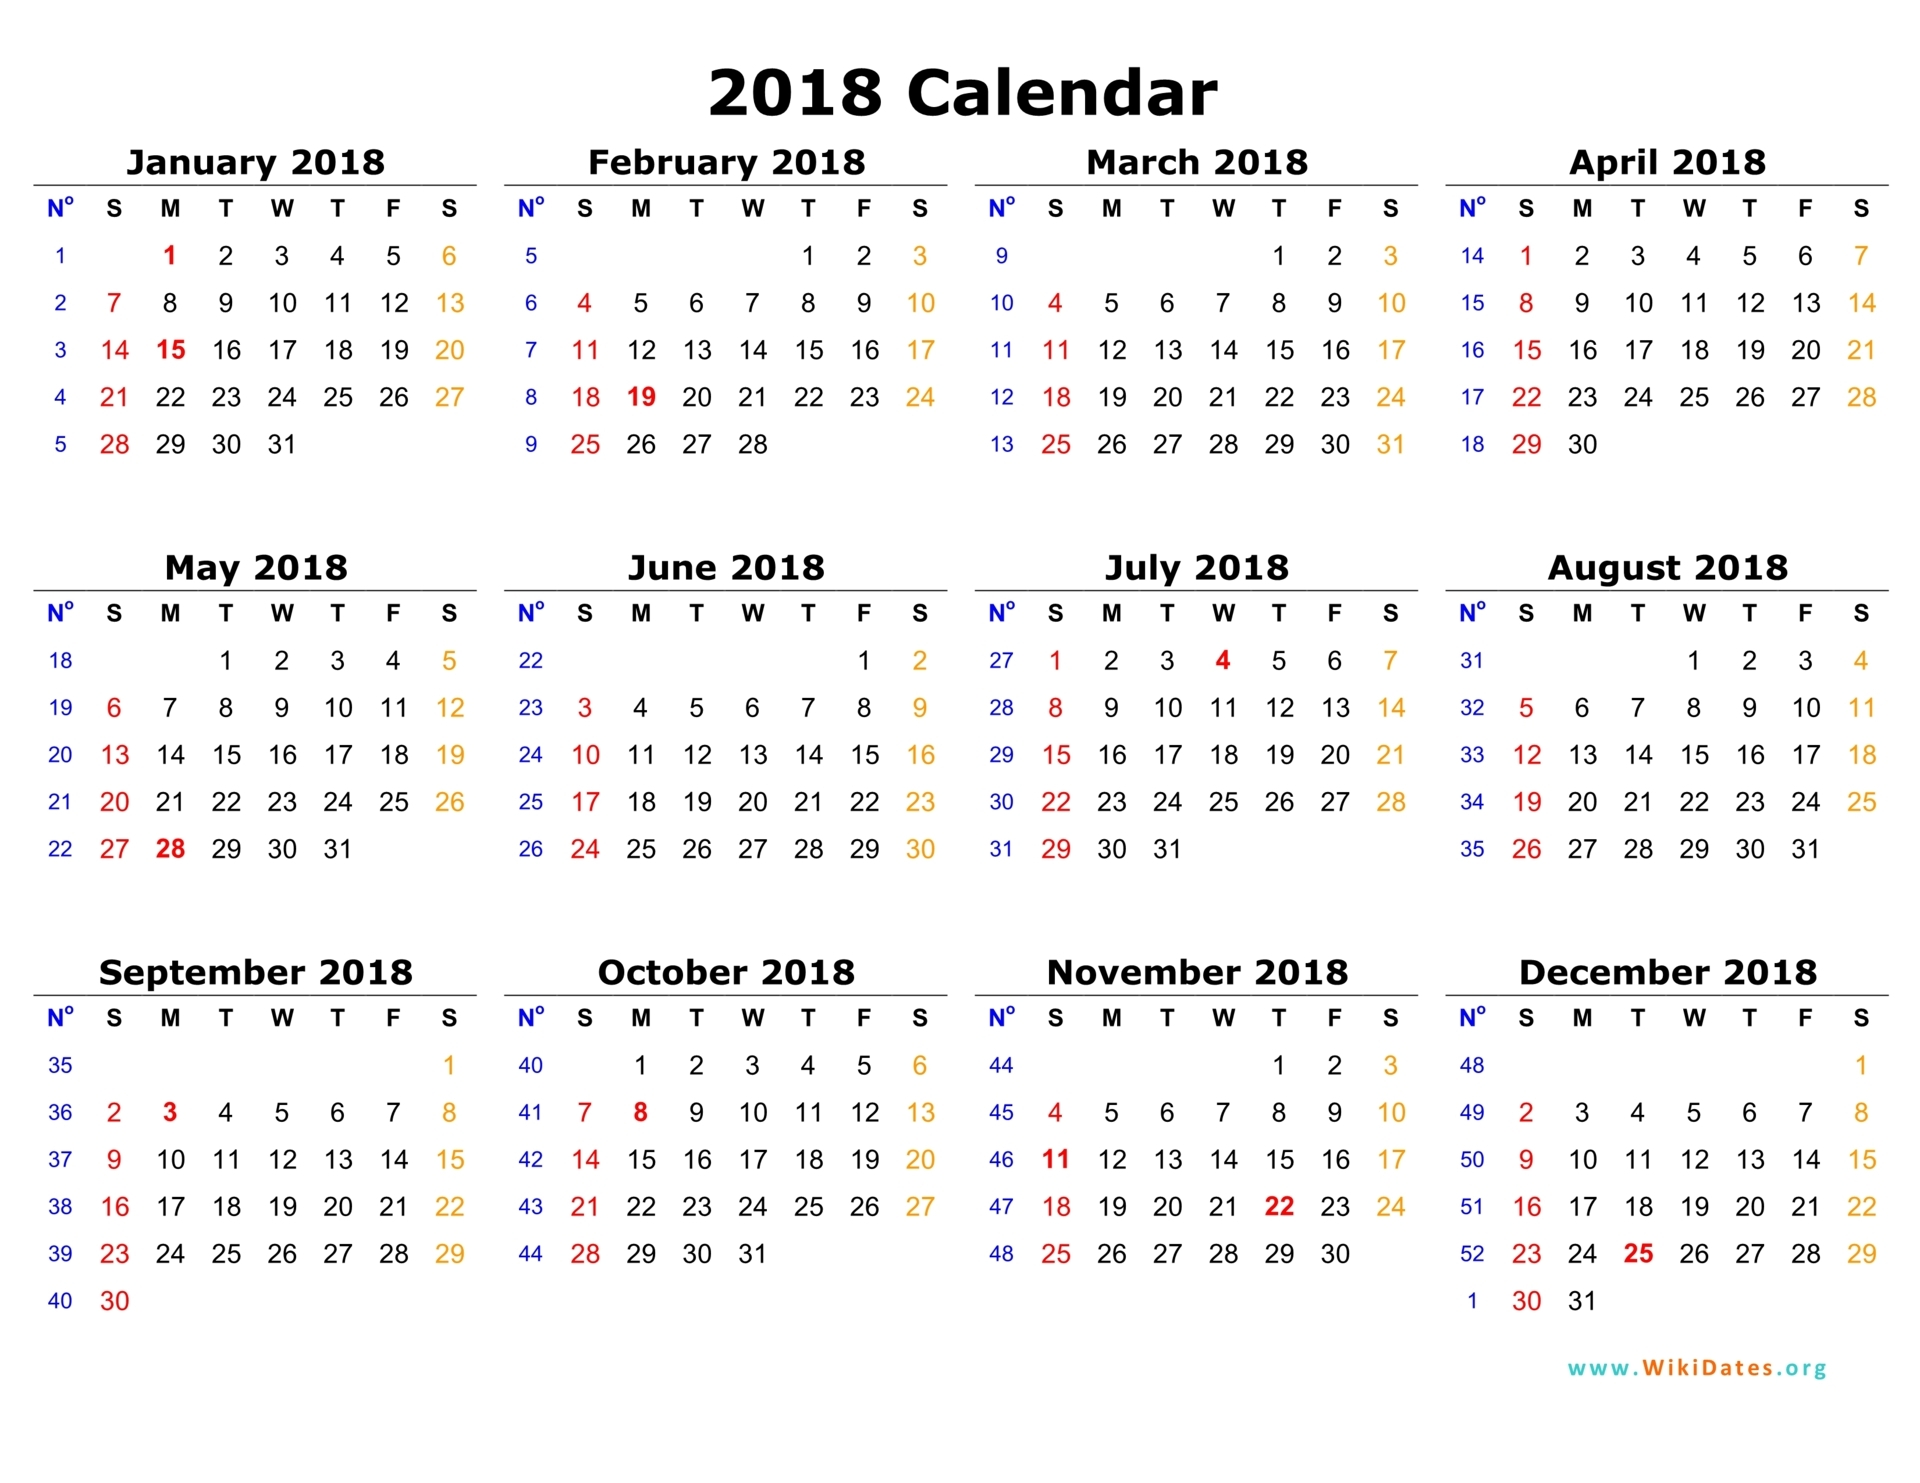 2018 Calendar   WikiDates.org